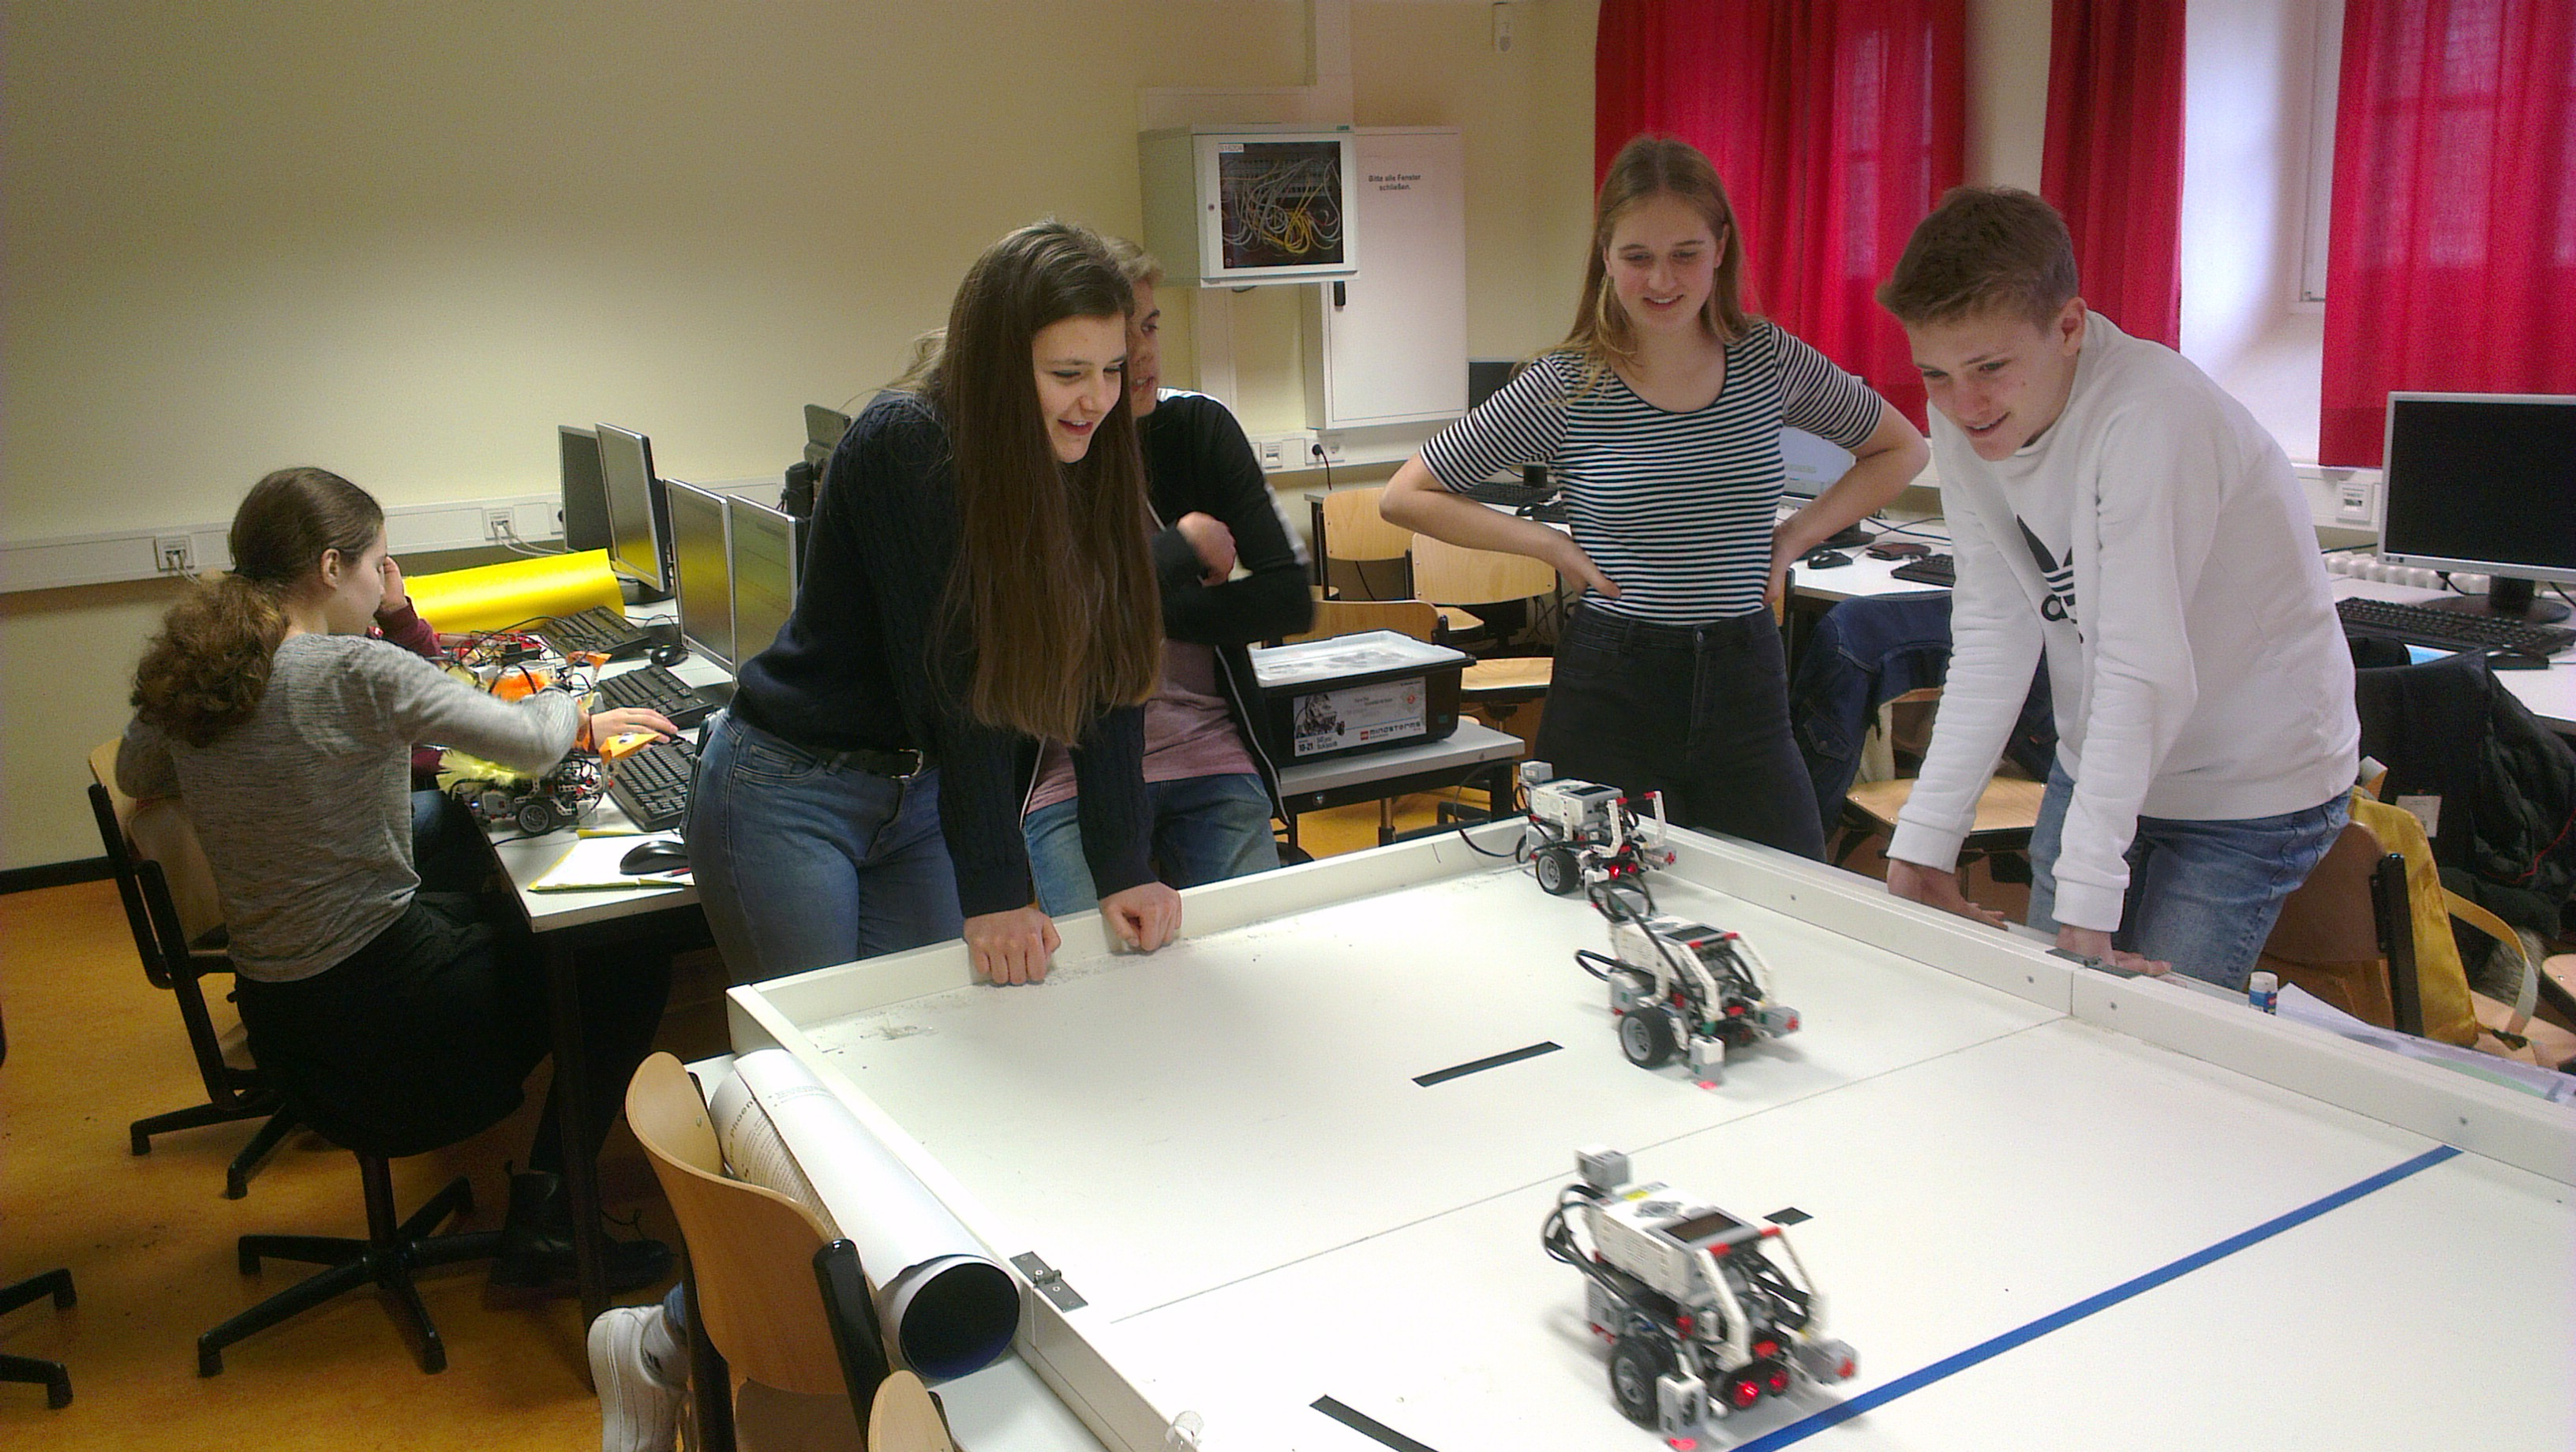 Eigene Roboter programmieren: Roberta-Projekt